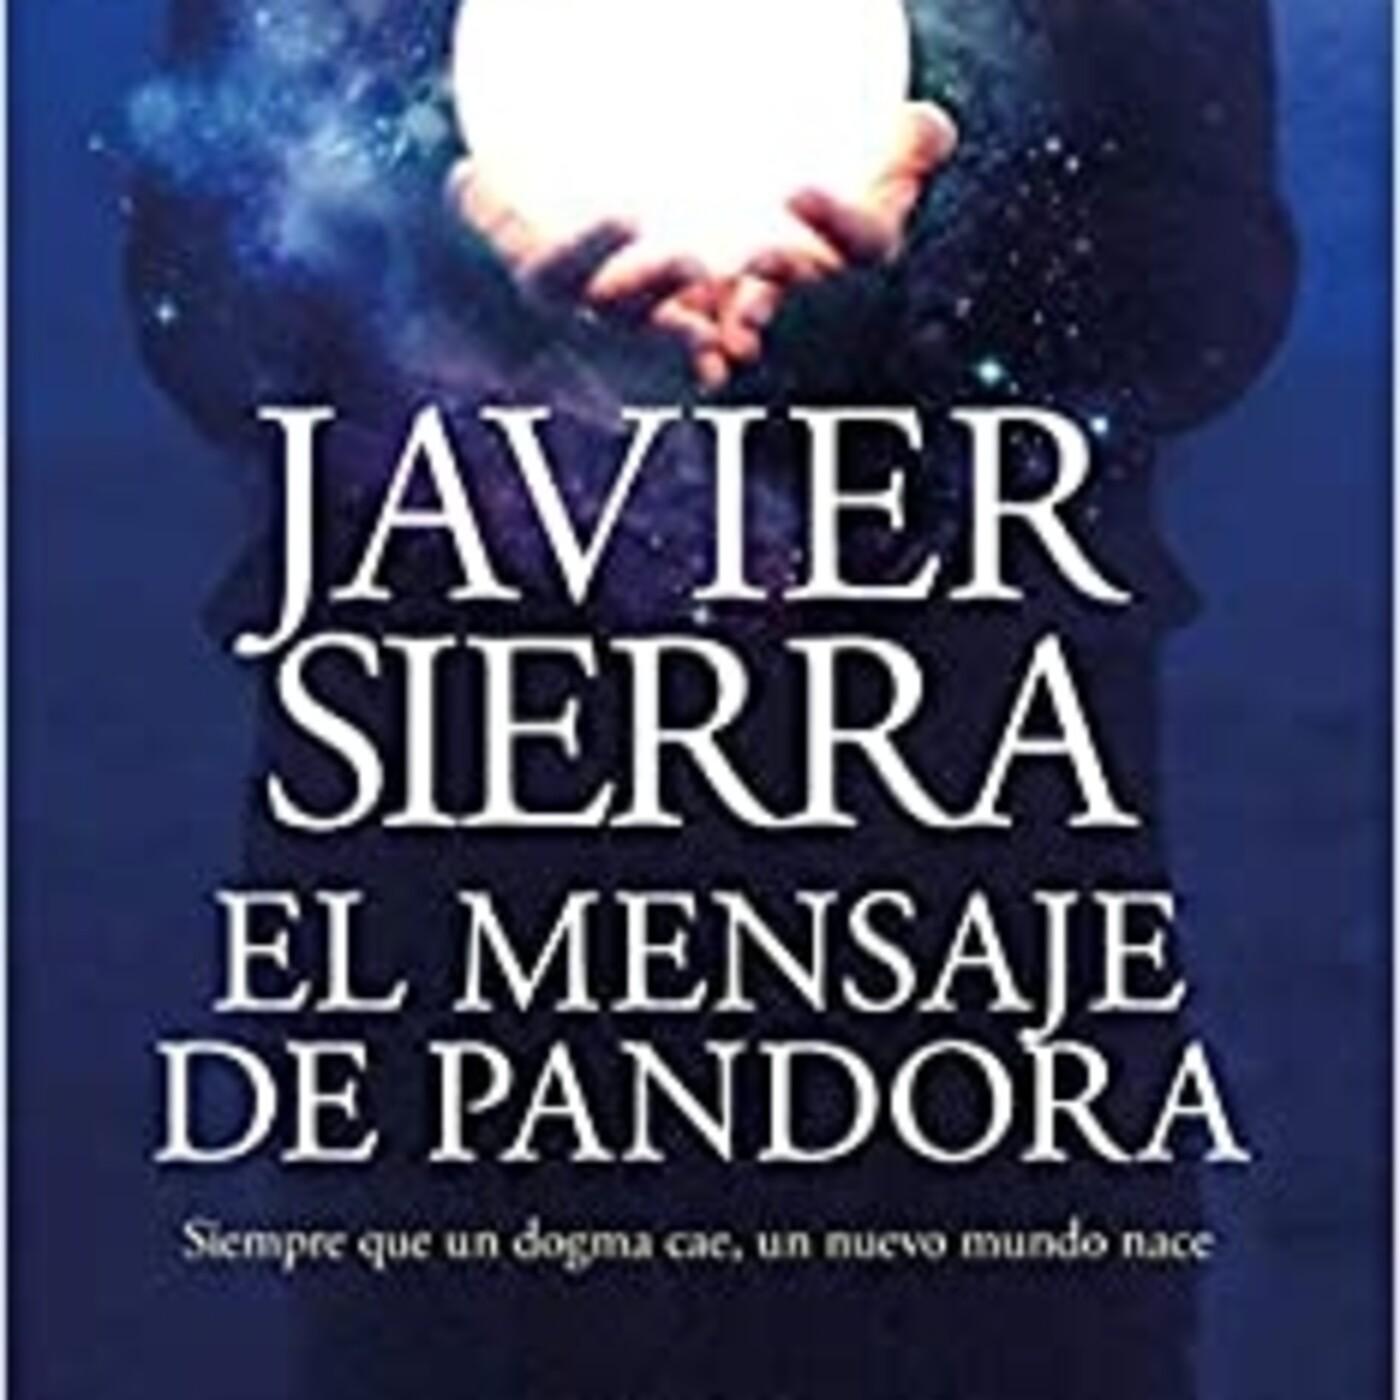 'El mensaje de Pandora' de Javier Sierra